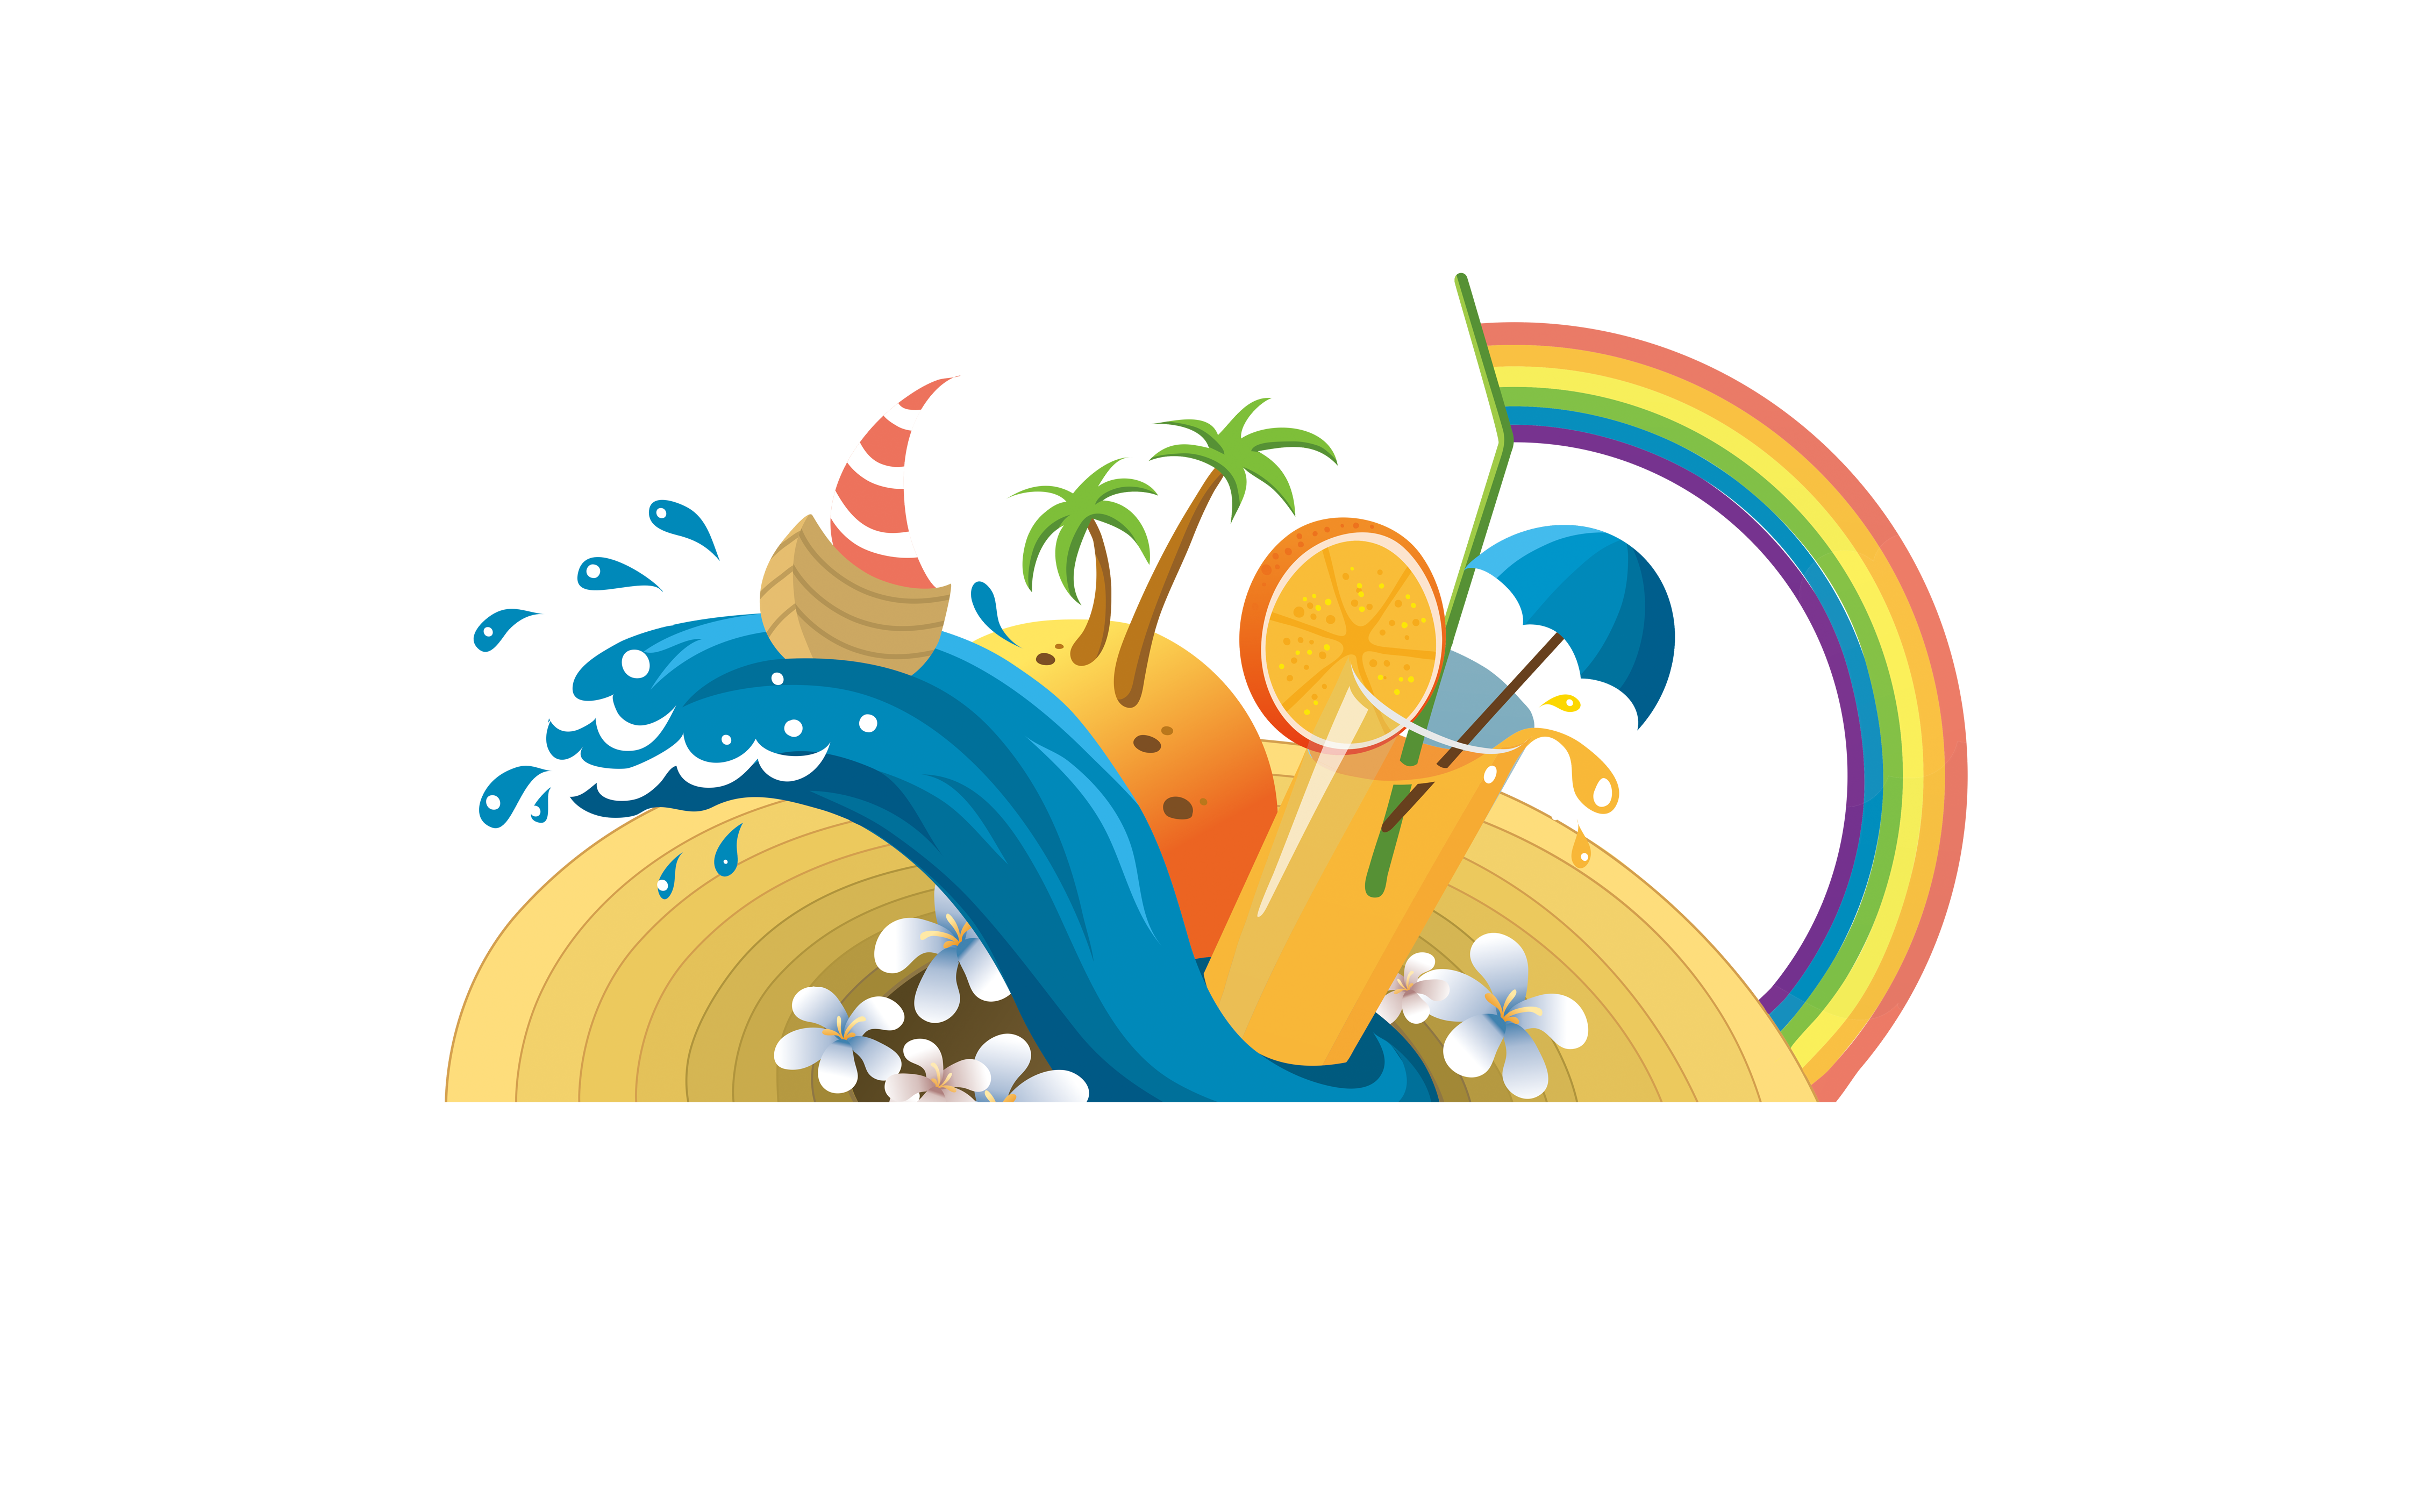 png transparent download Drawing rainbows castle. Visual arts graphic design